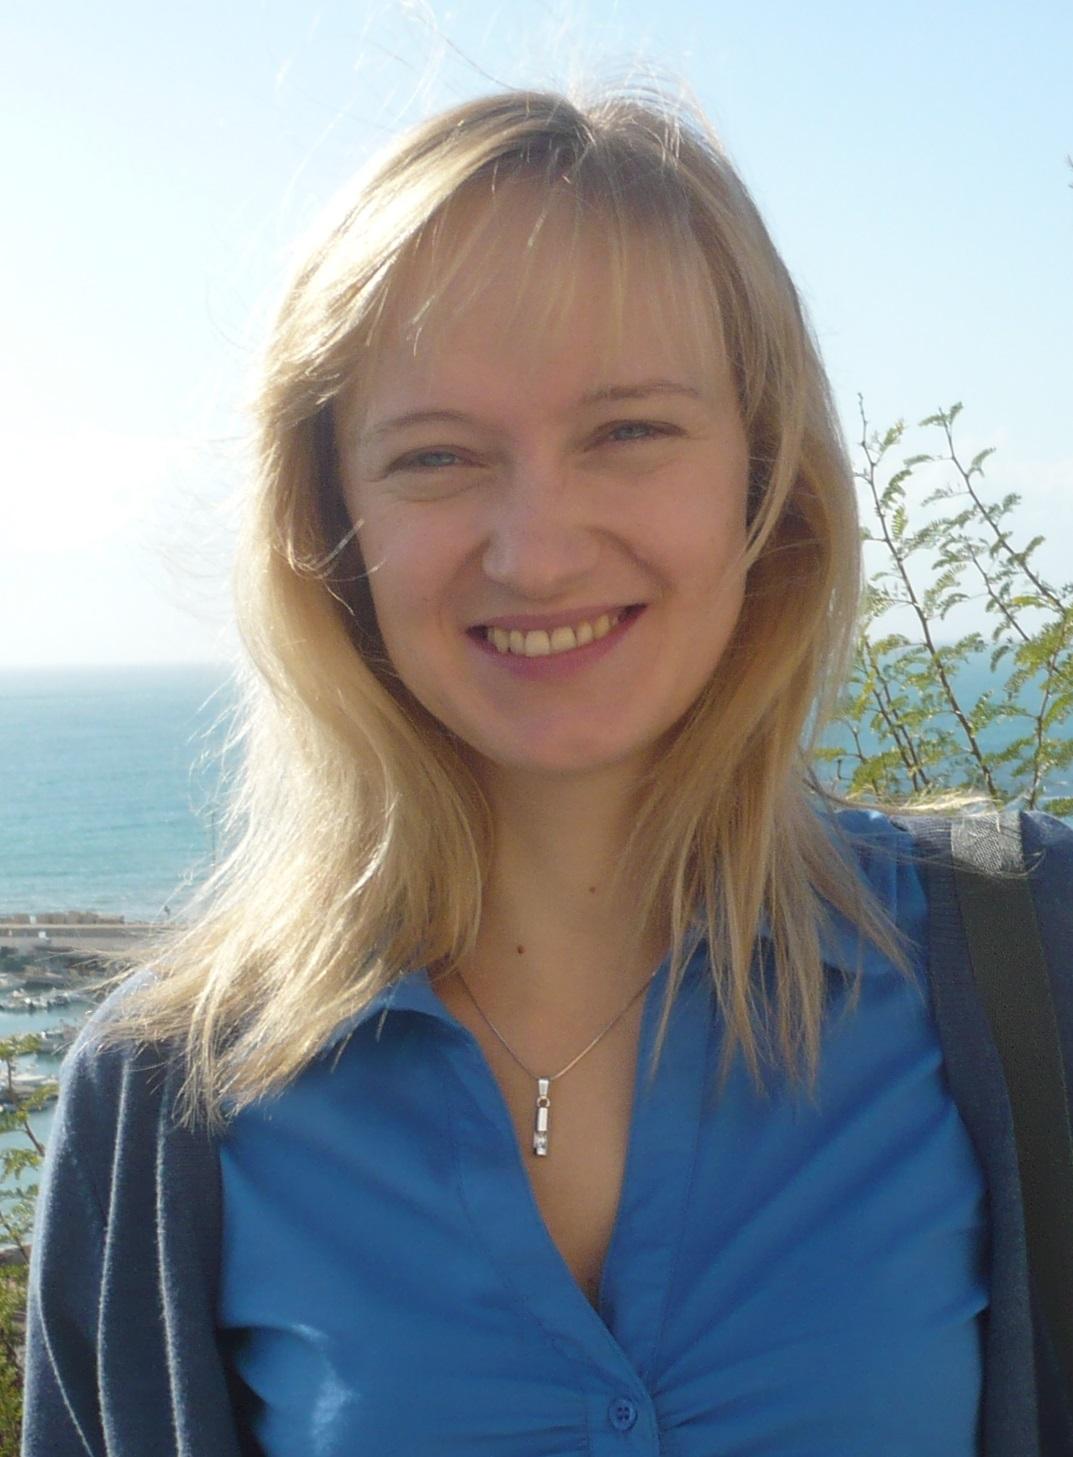 Agnieszka Gaweonska